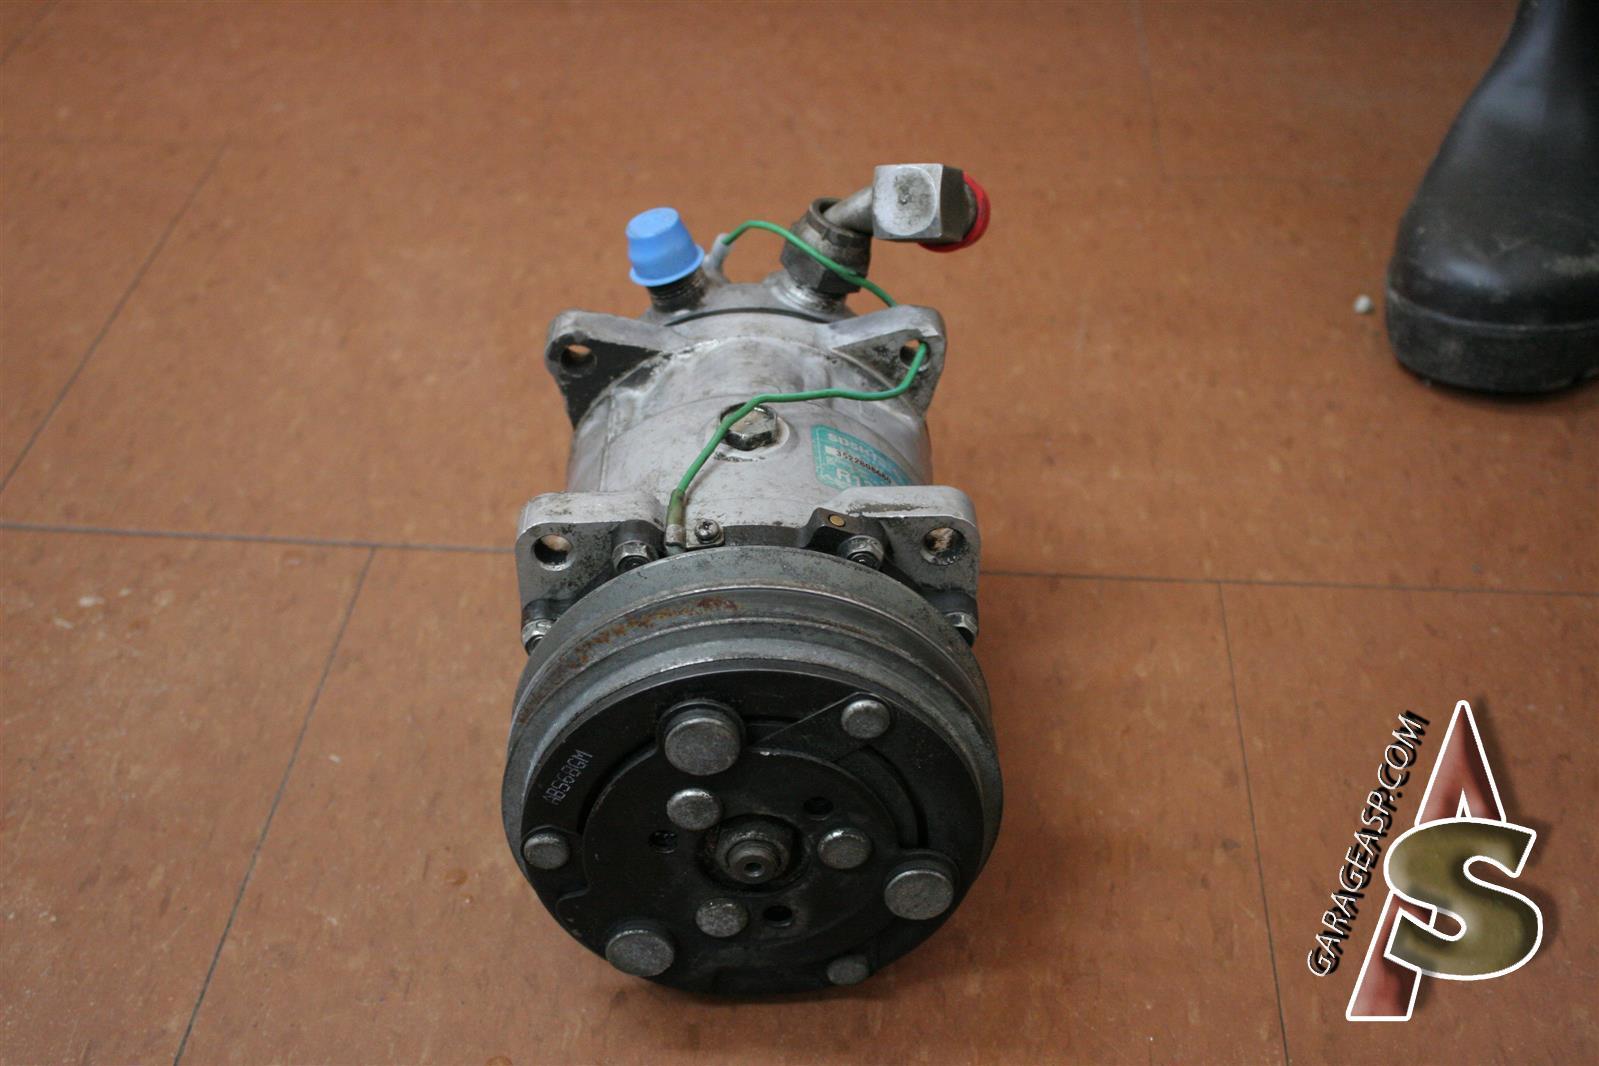 Timberjack Equipment Parts - Heavy equipment parts